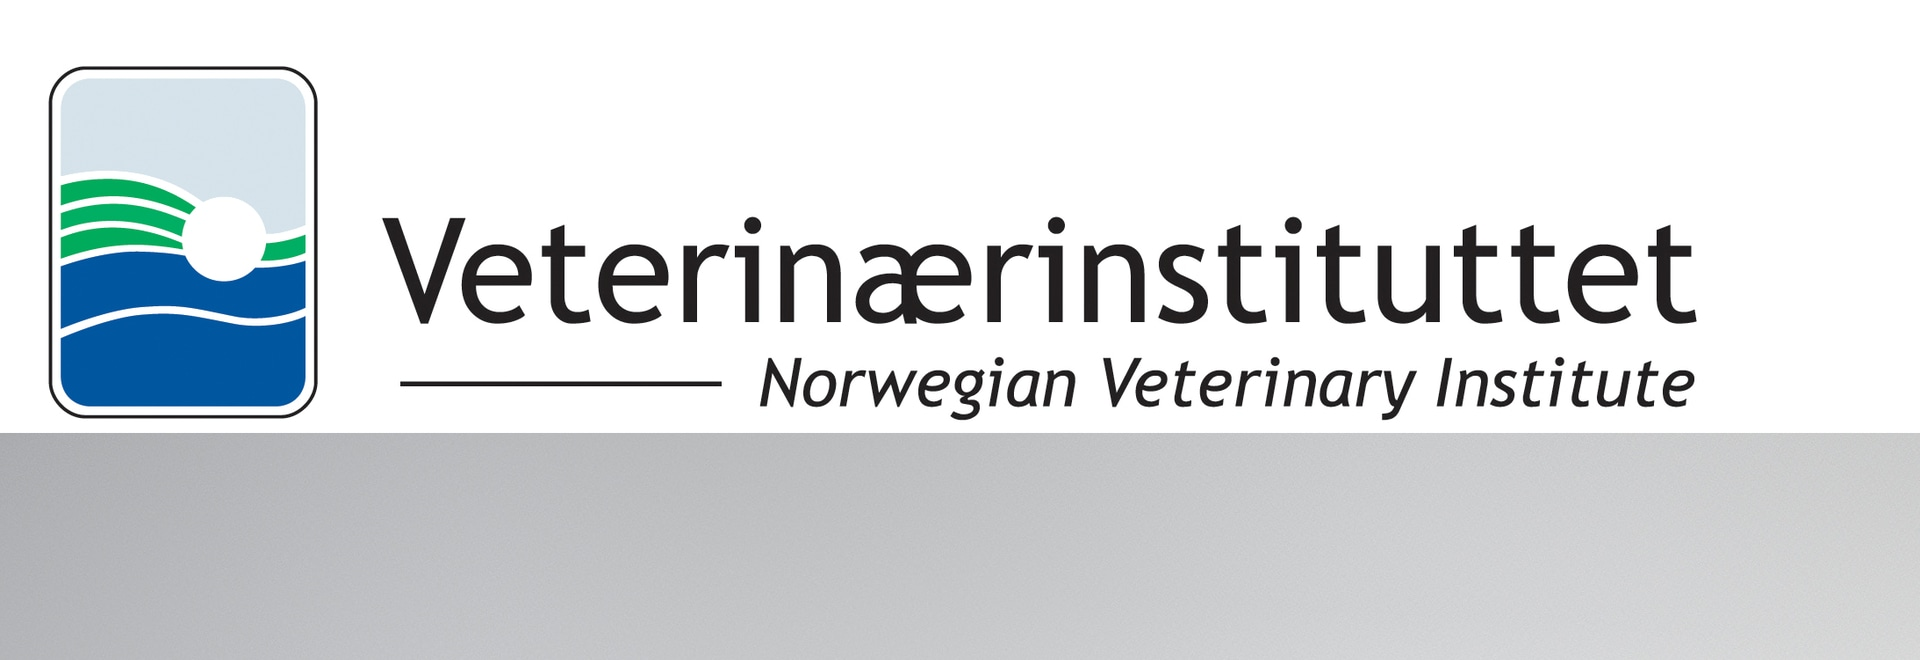 Veterinaerinstituttet - Norwegian Veterinary Institute